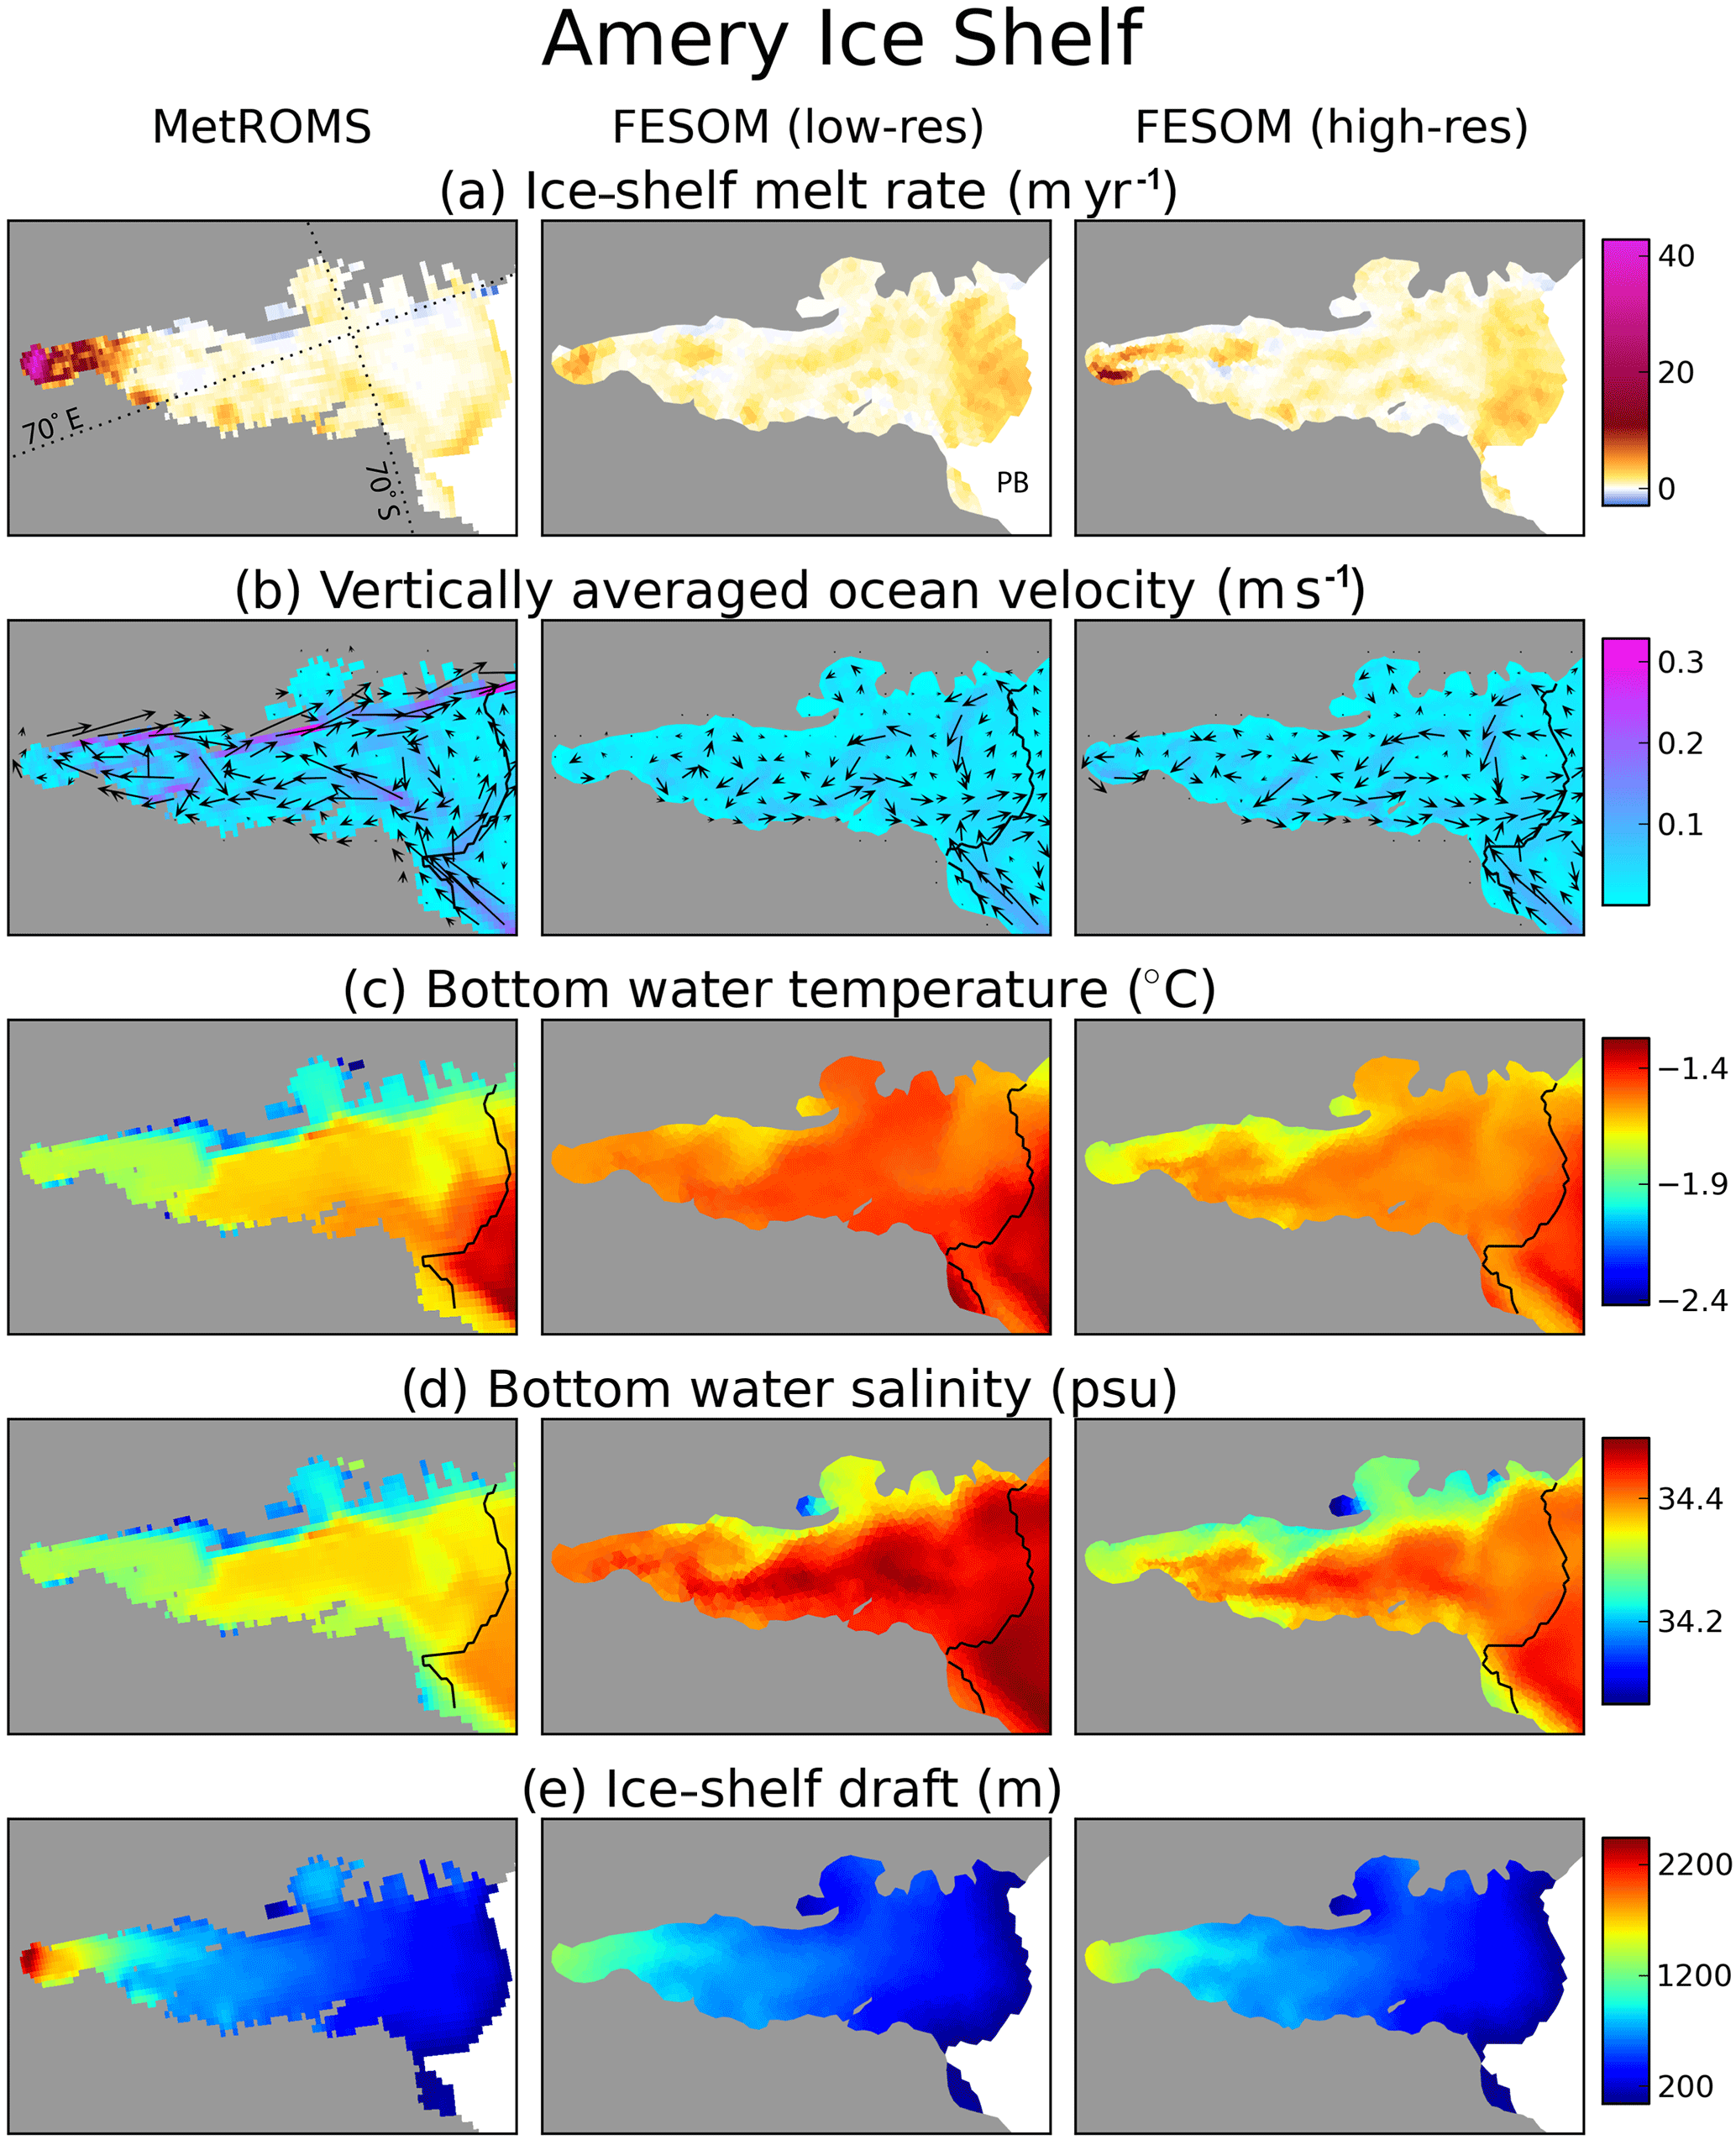 GMD - Intercomparison of Antarctic ice-shelf, ocean, and sea